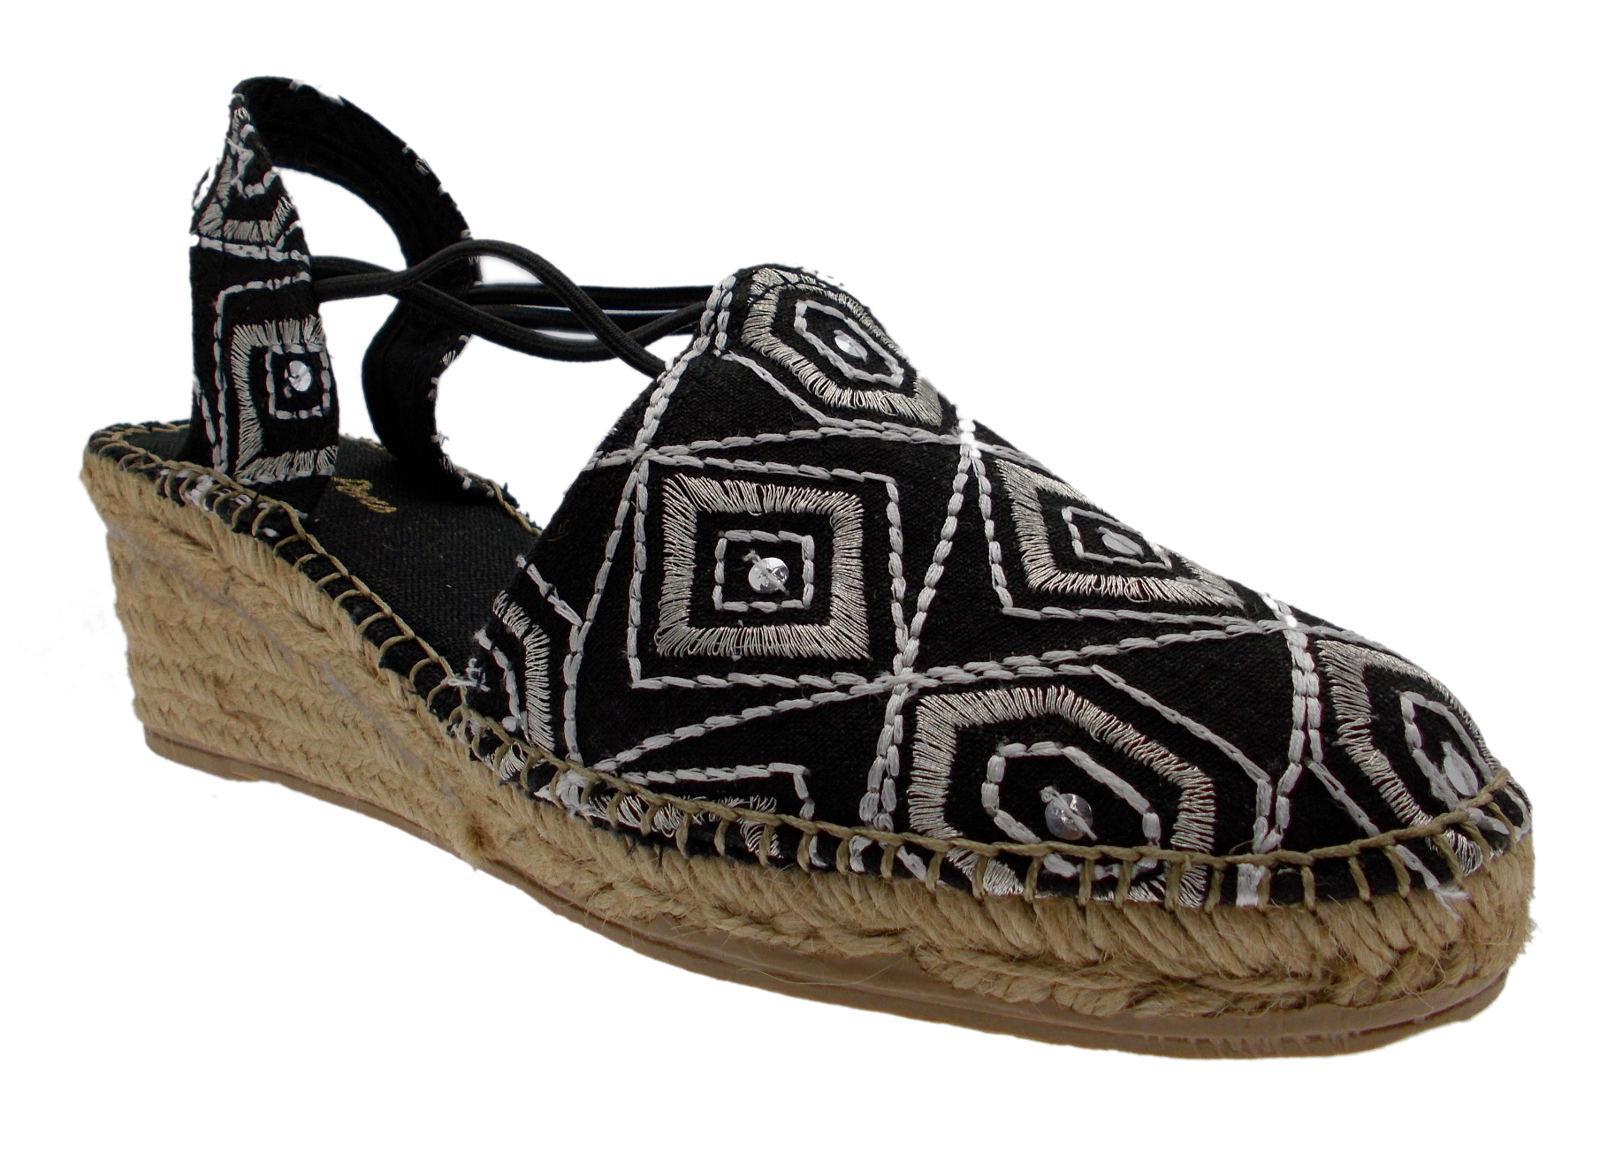 CAFè pantofola NOIR GH909 Sandali donna pantofola CAFè due fasce incrociate con borchie argento 235558